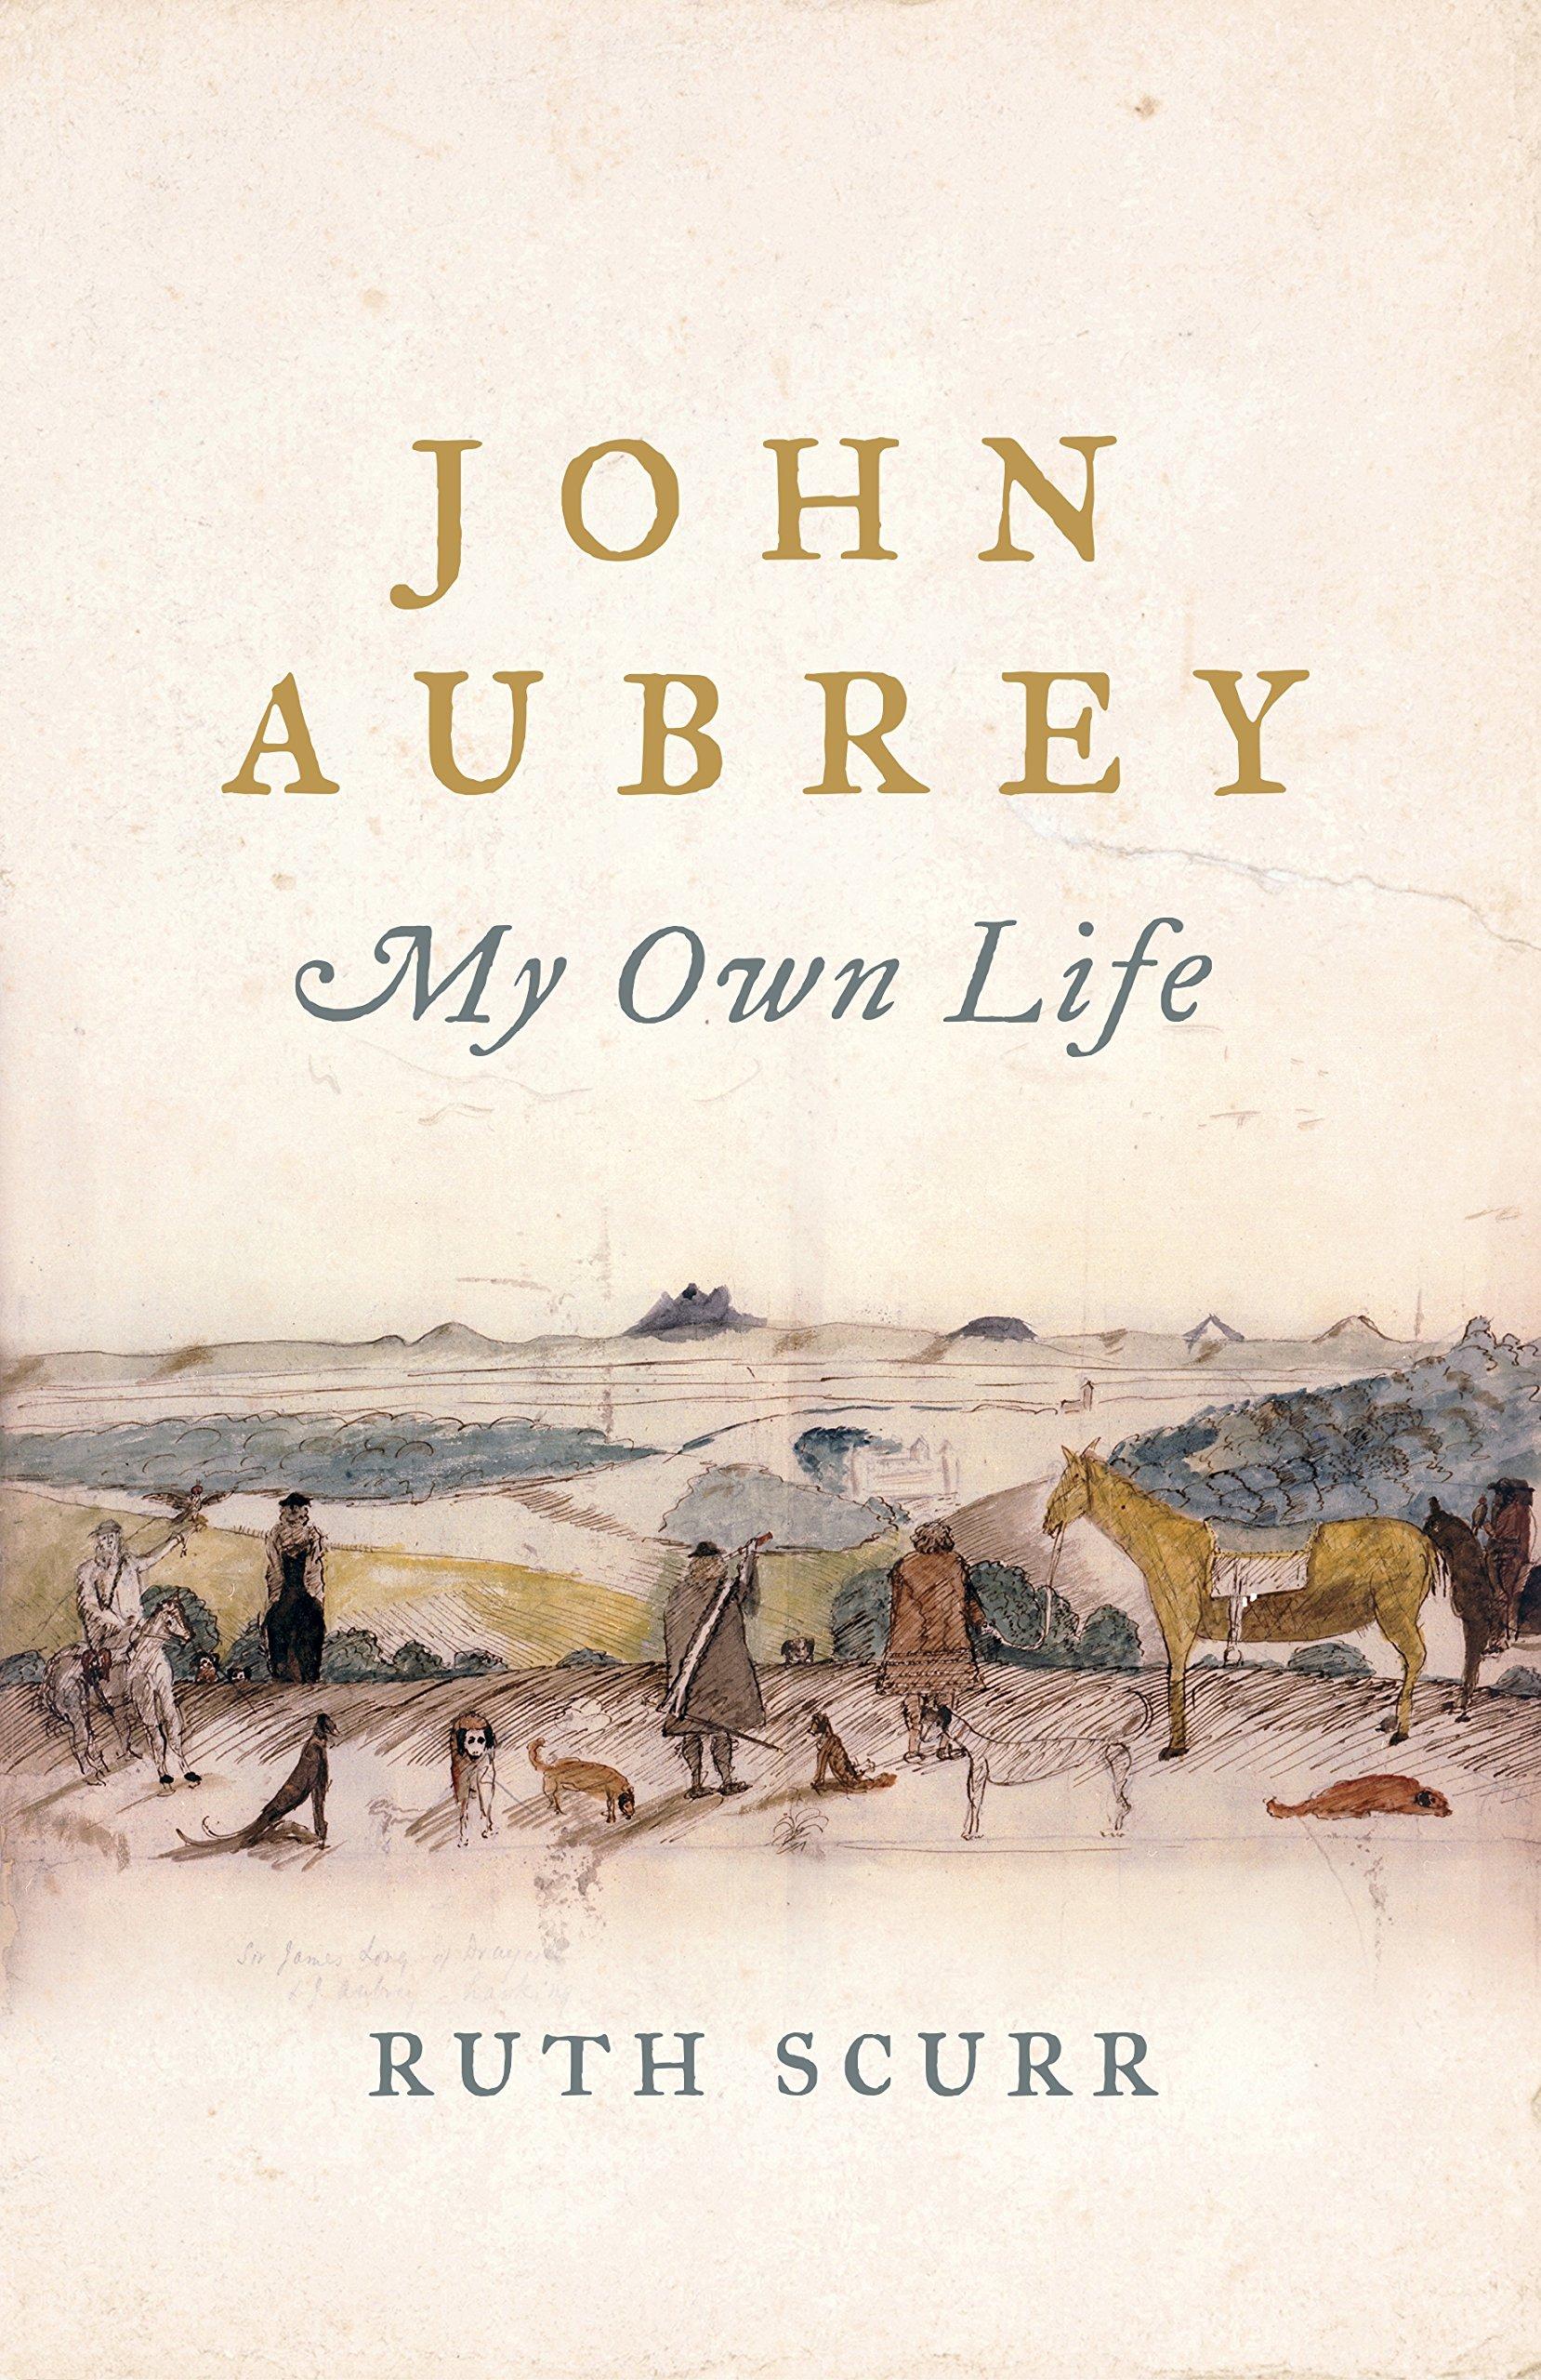 John Aubrey My Own Life by Ruth Scurr.jpg